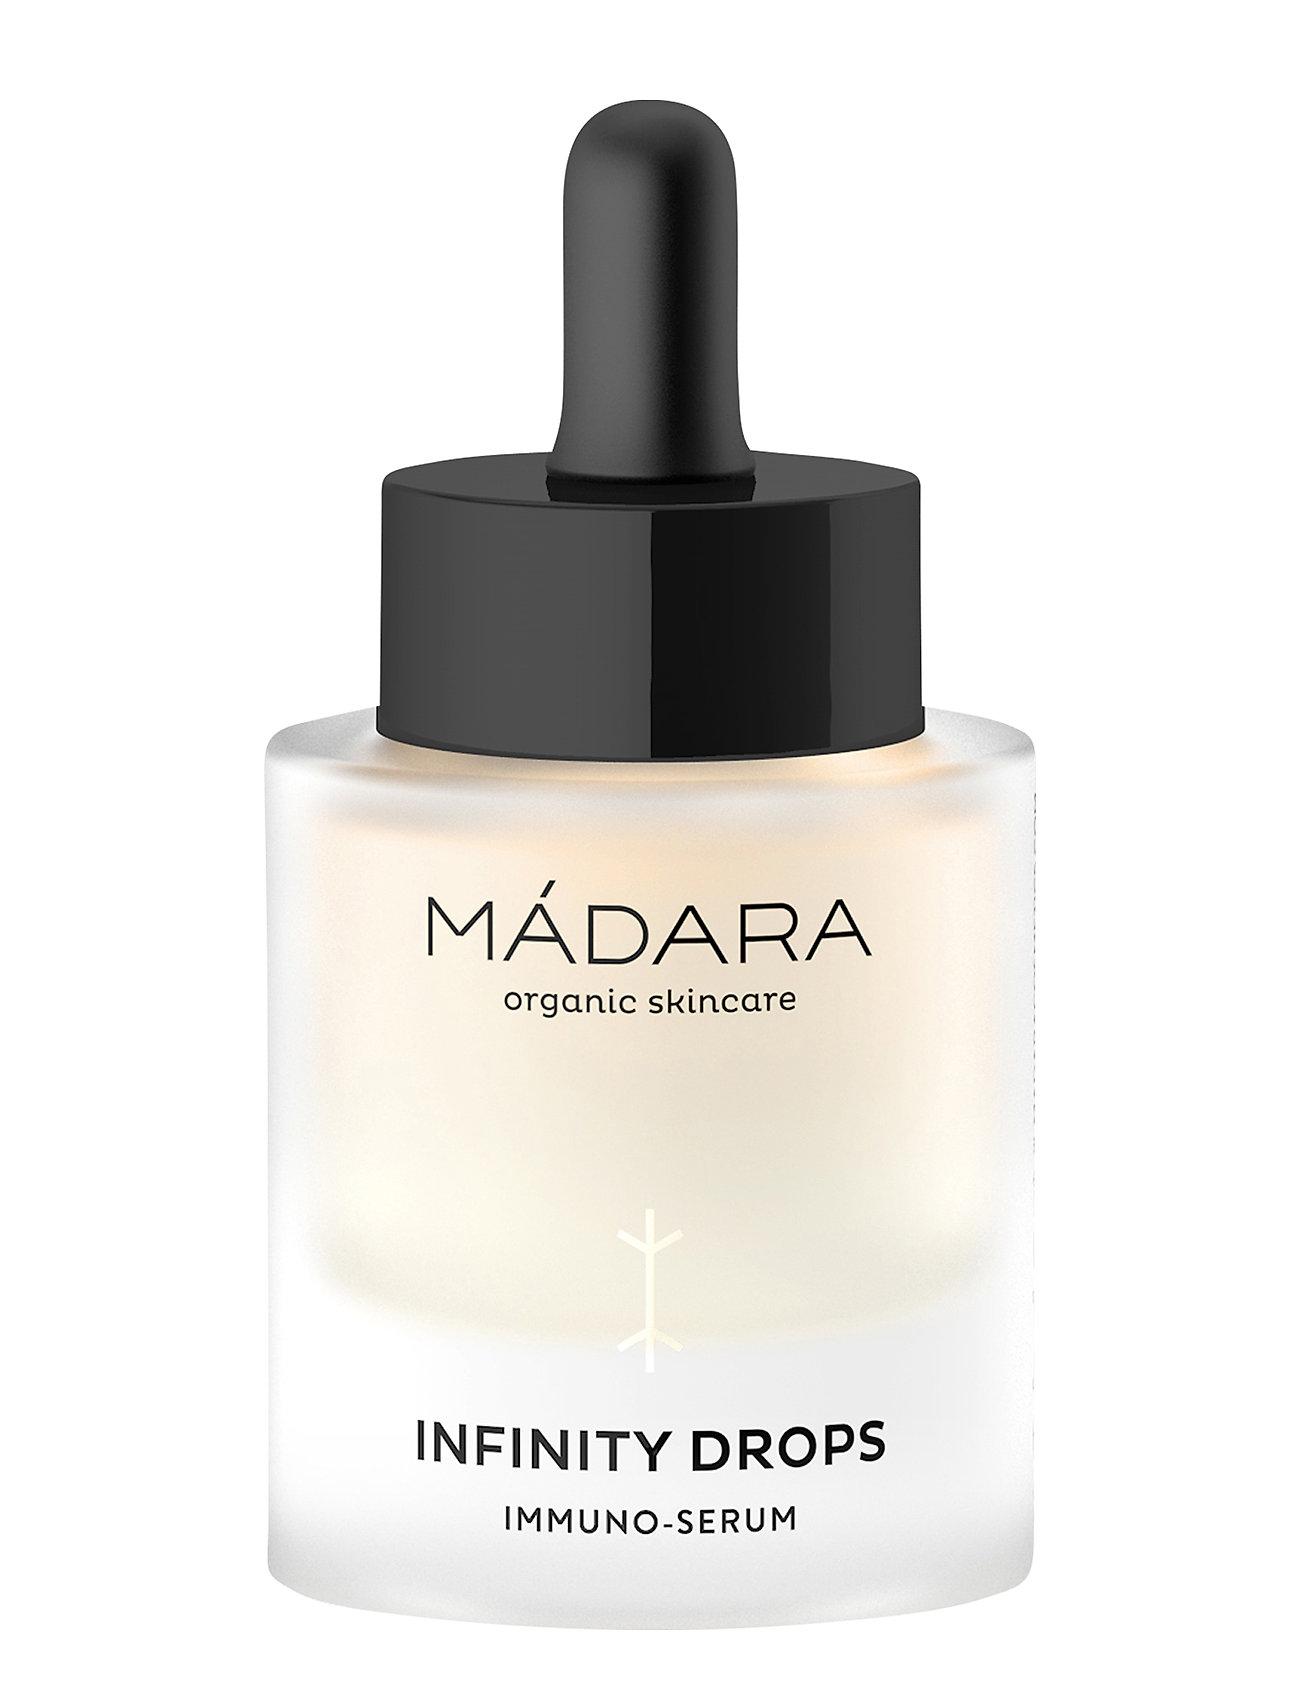 MÁDARA INFINITY Drops Immuno-serum, 30ml - CLEAR